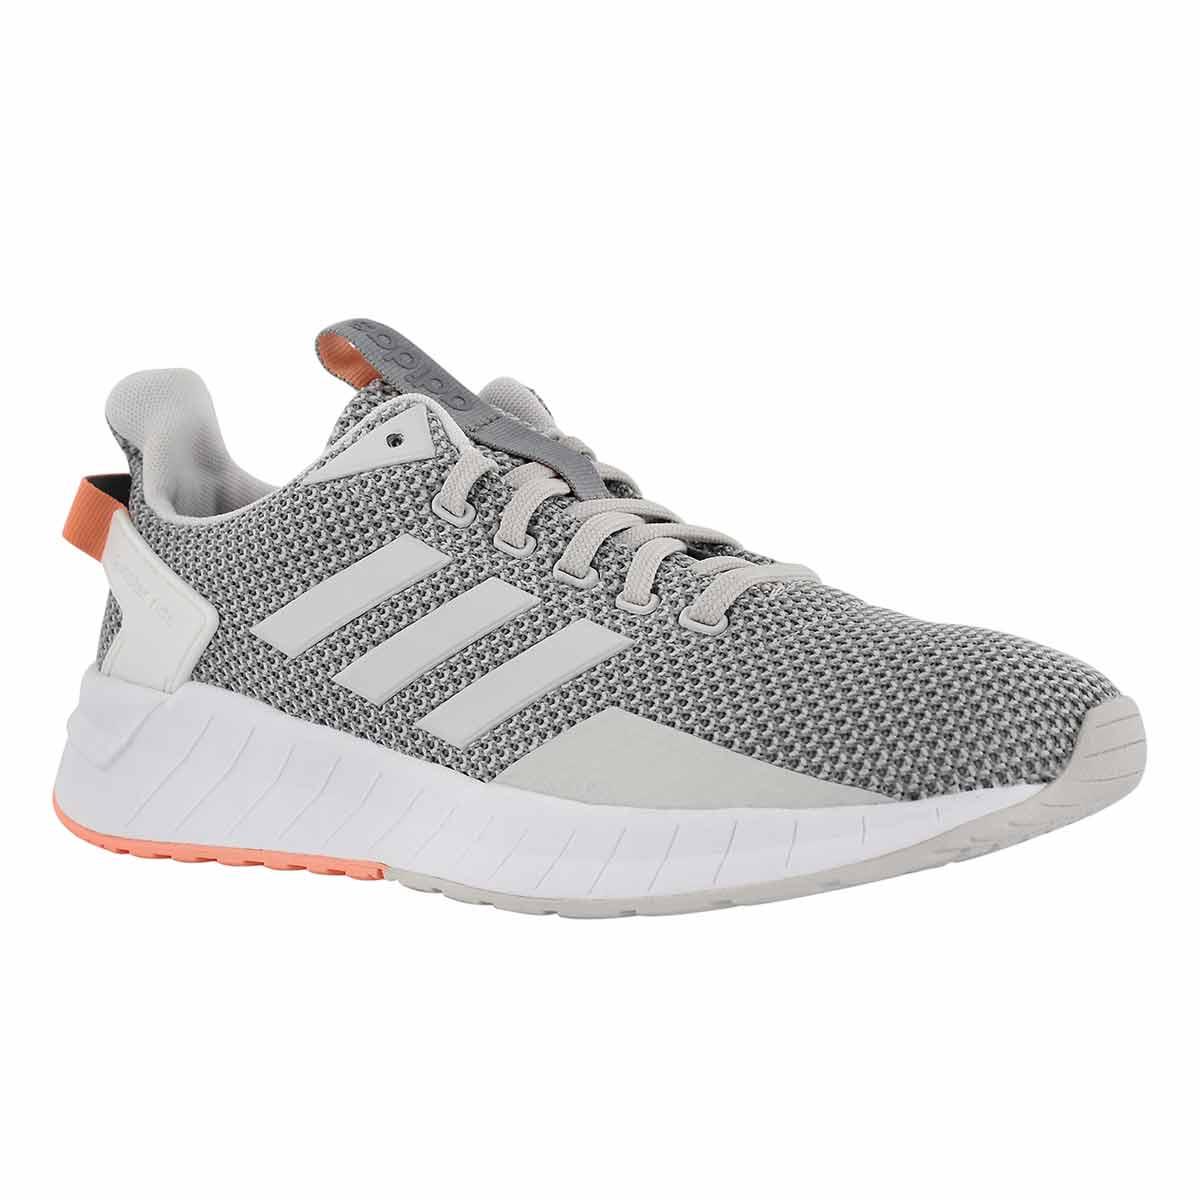 sports shoes 0c948 548dd Women's QUESTAR RIDE grey running shoes